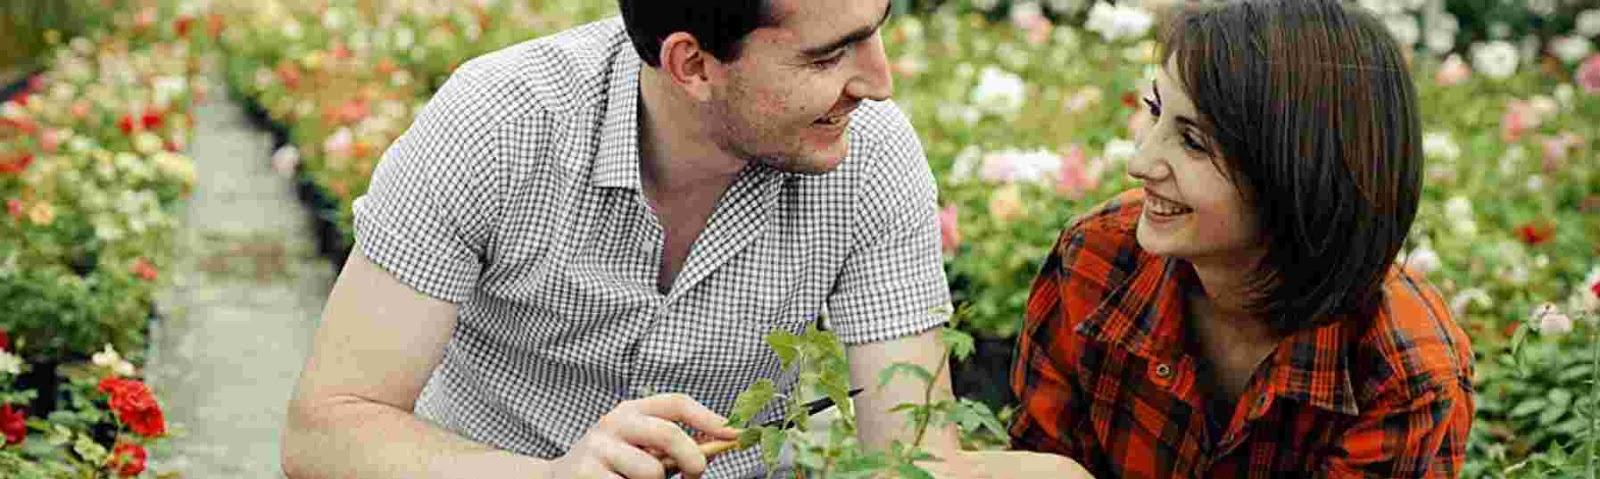 como cuidar tu matrimonio como un jardin